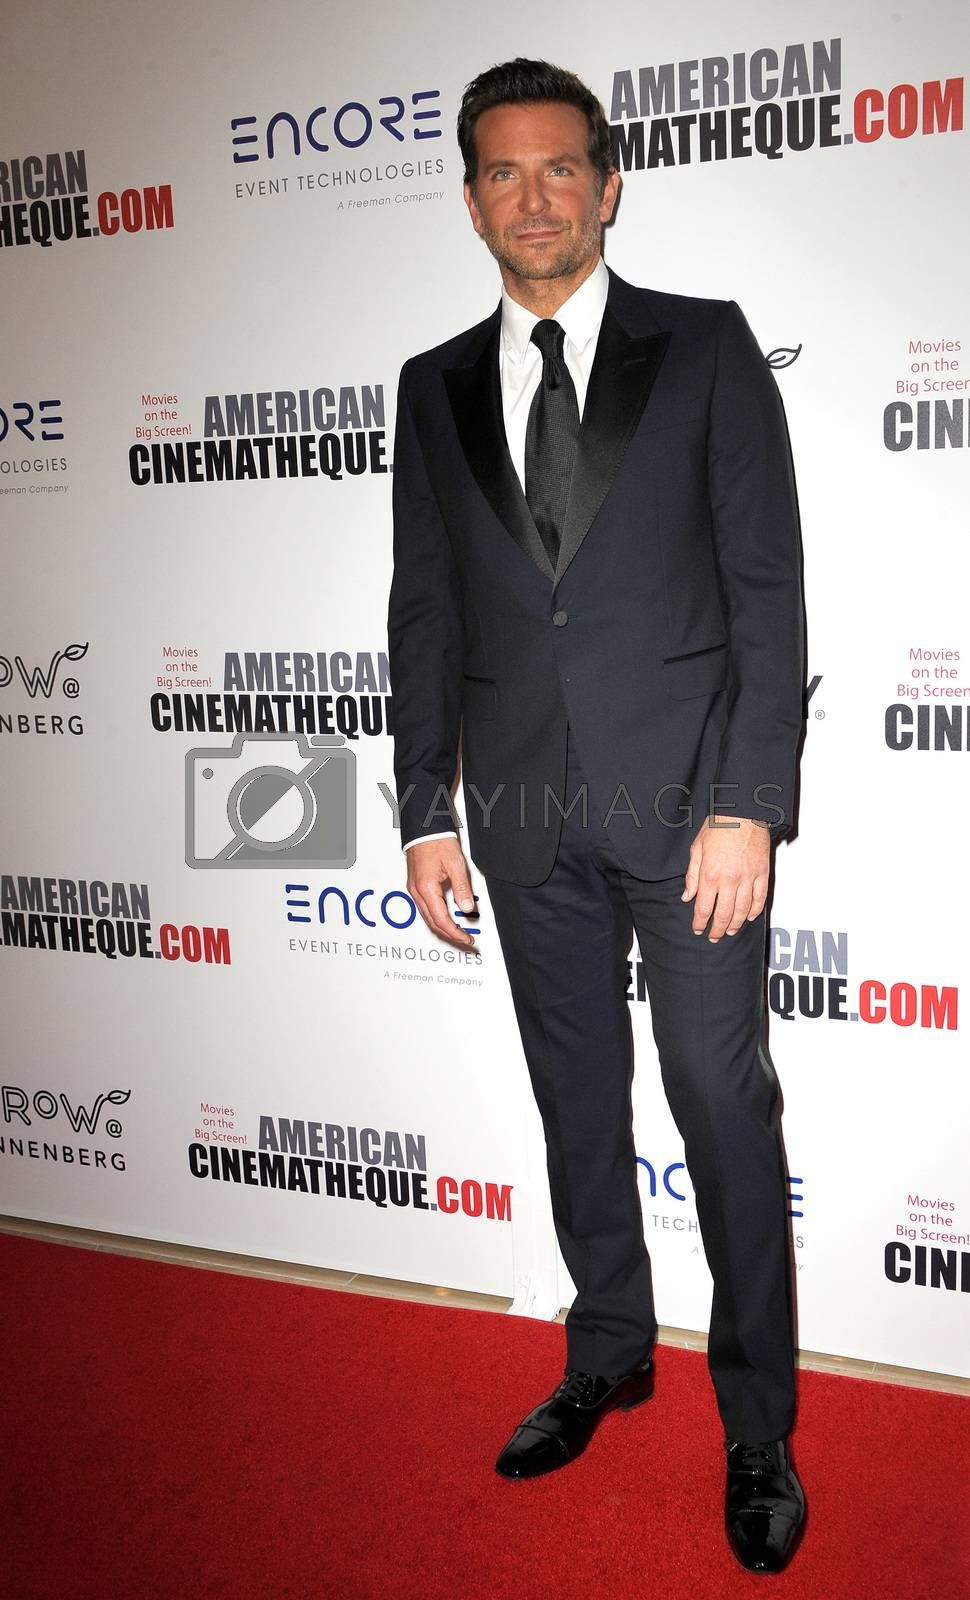 Bradley Cooper by Lumeimages